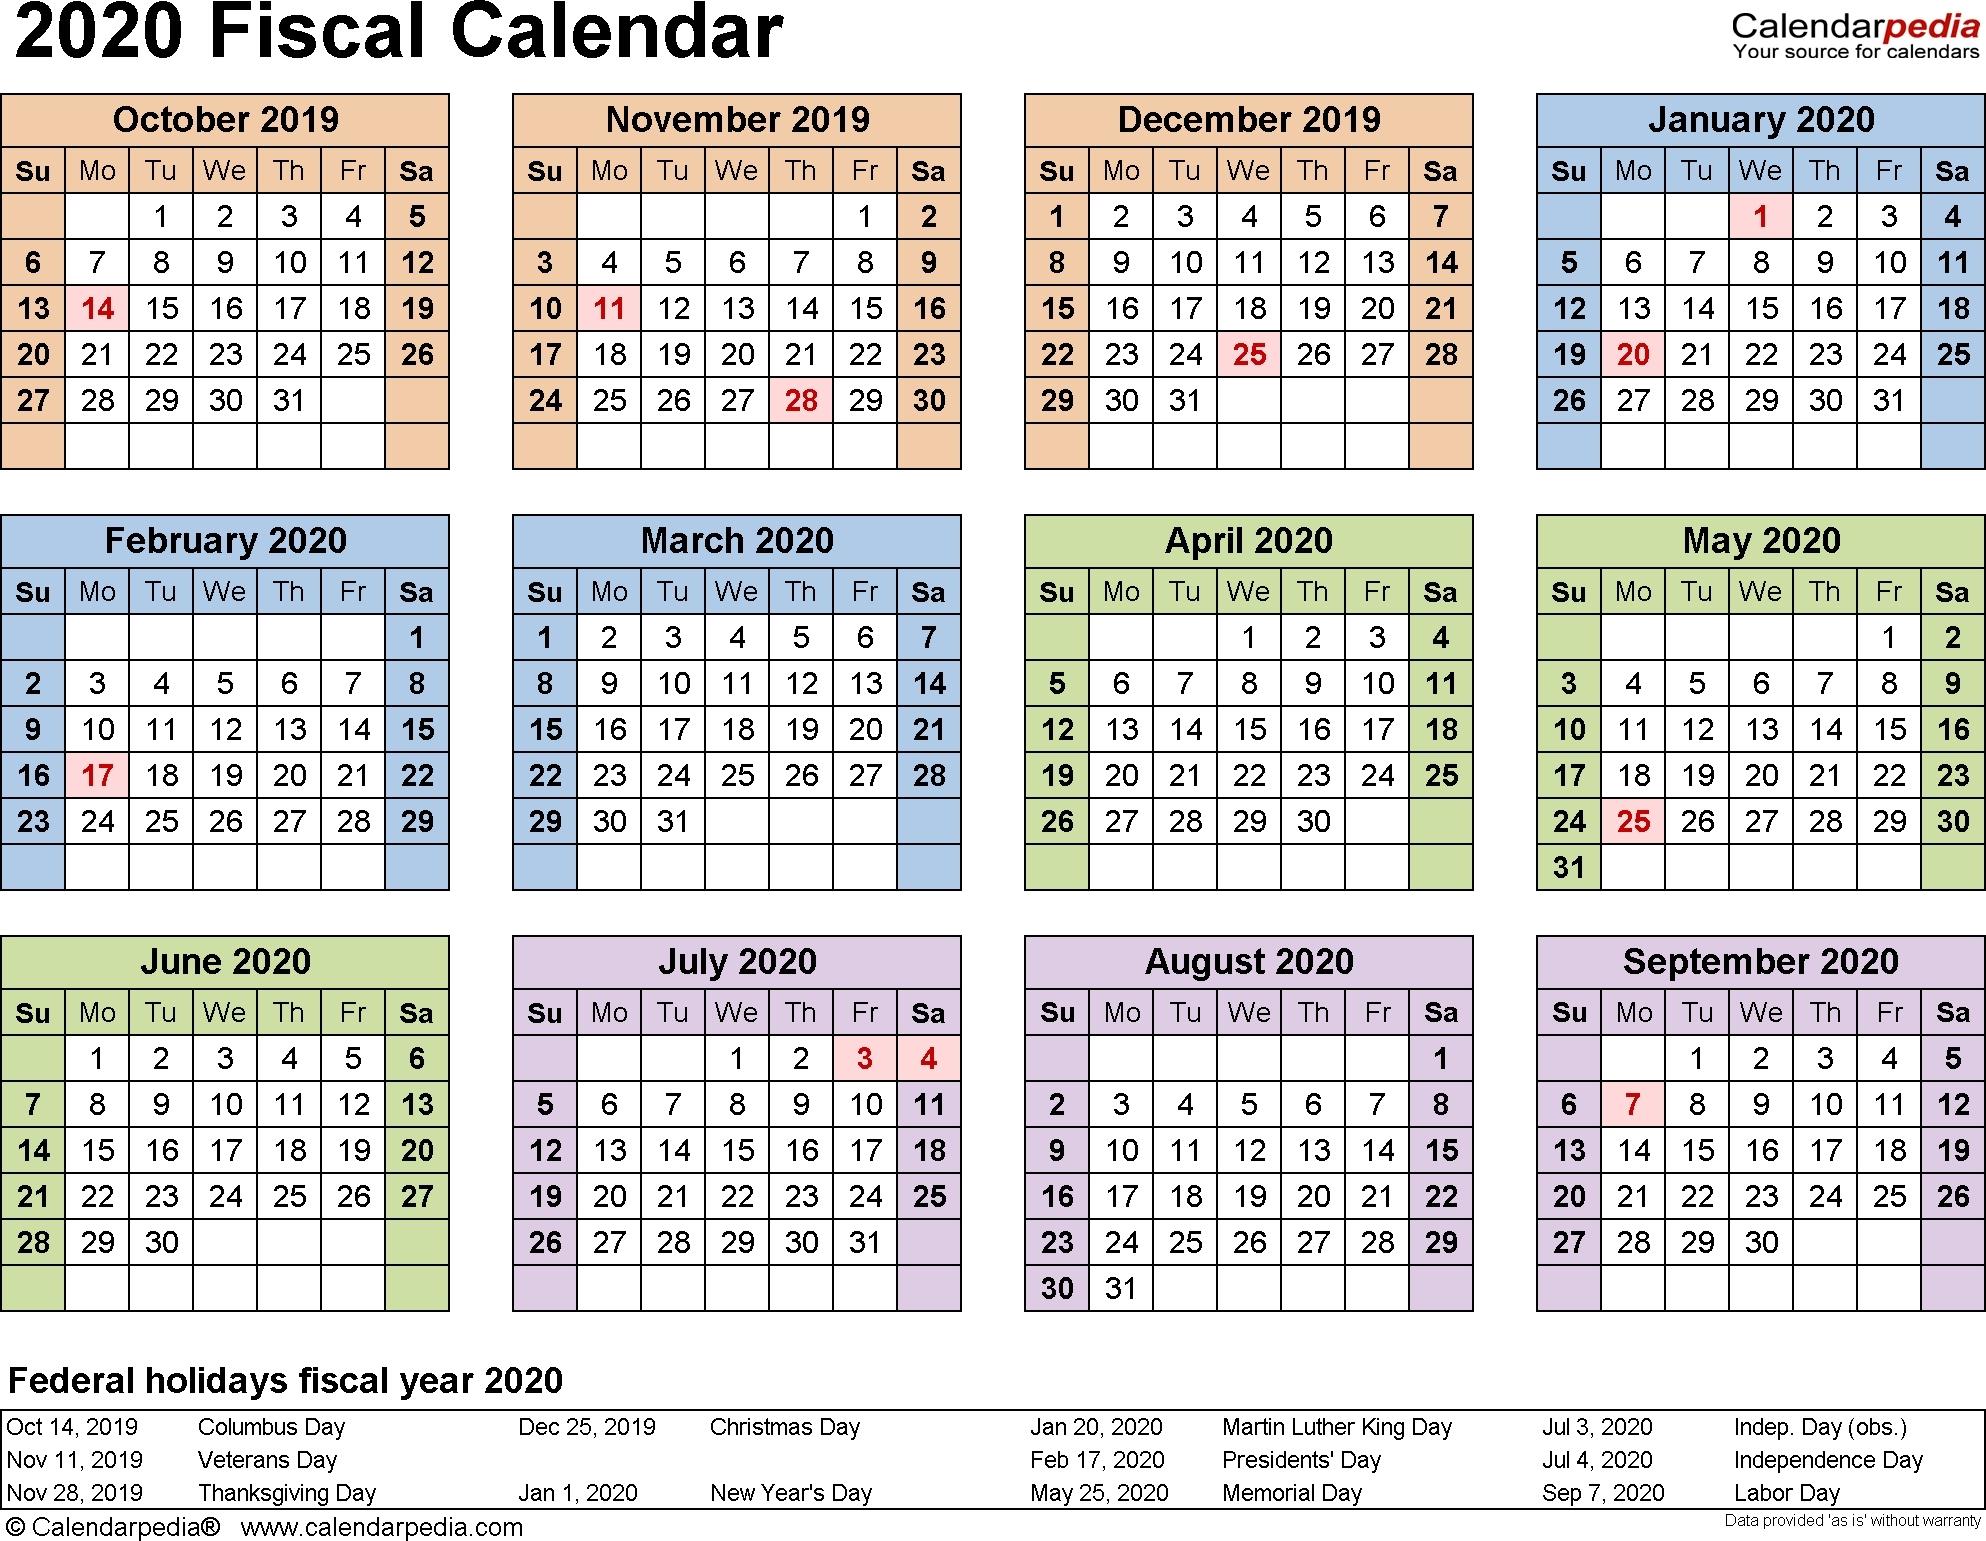 Payroll Calendar Dod 2020 | Payroll Calendar 2020-Biweekly Payroll Calendar 2020 Template